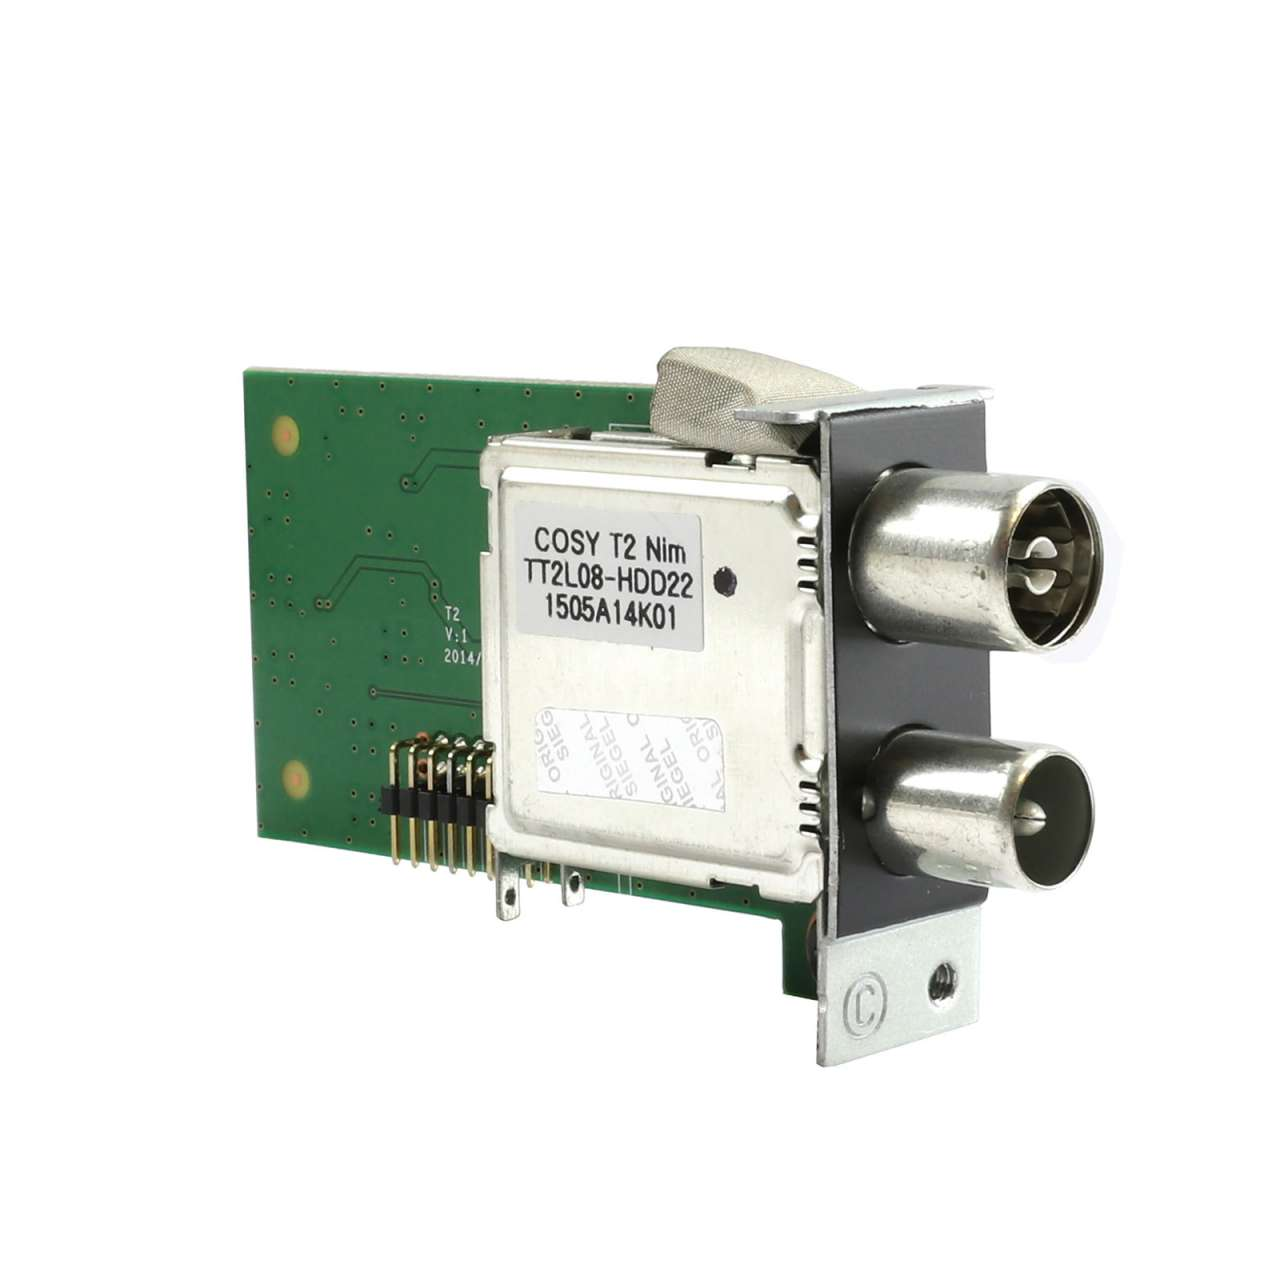 SAB Alpha Triple HD DVB-C/T2 Single Hybrid Plug & Play Tuner ZUBSAB005